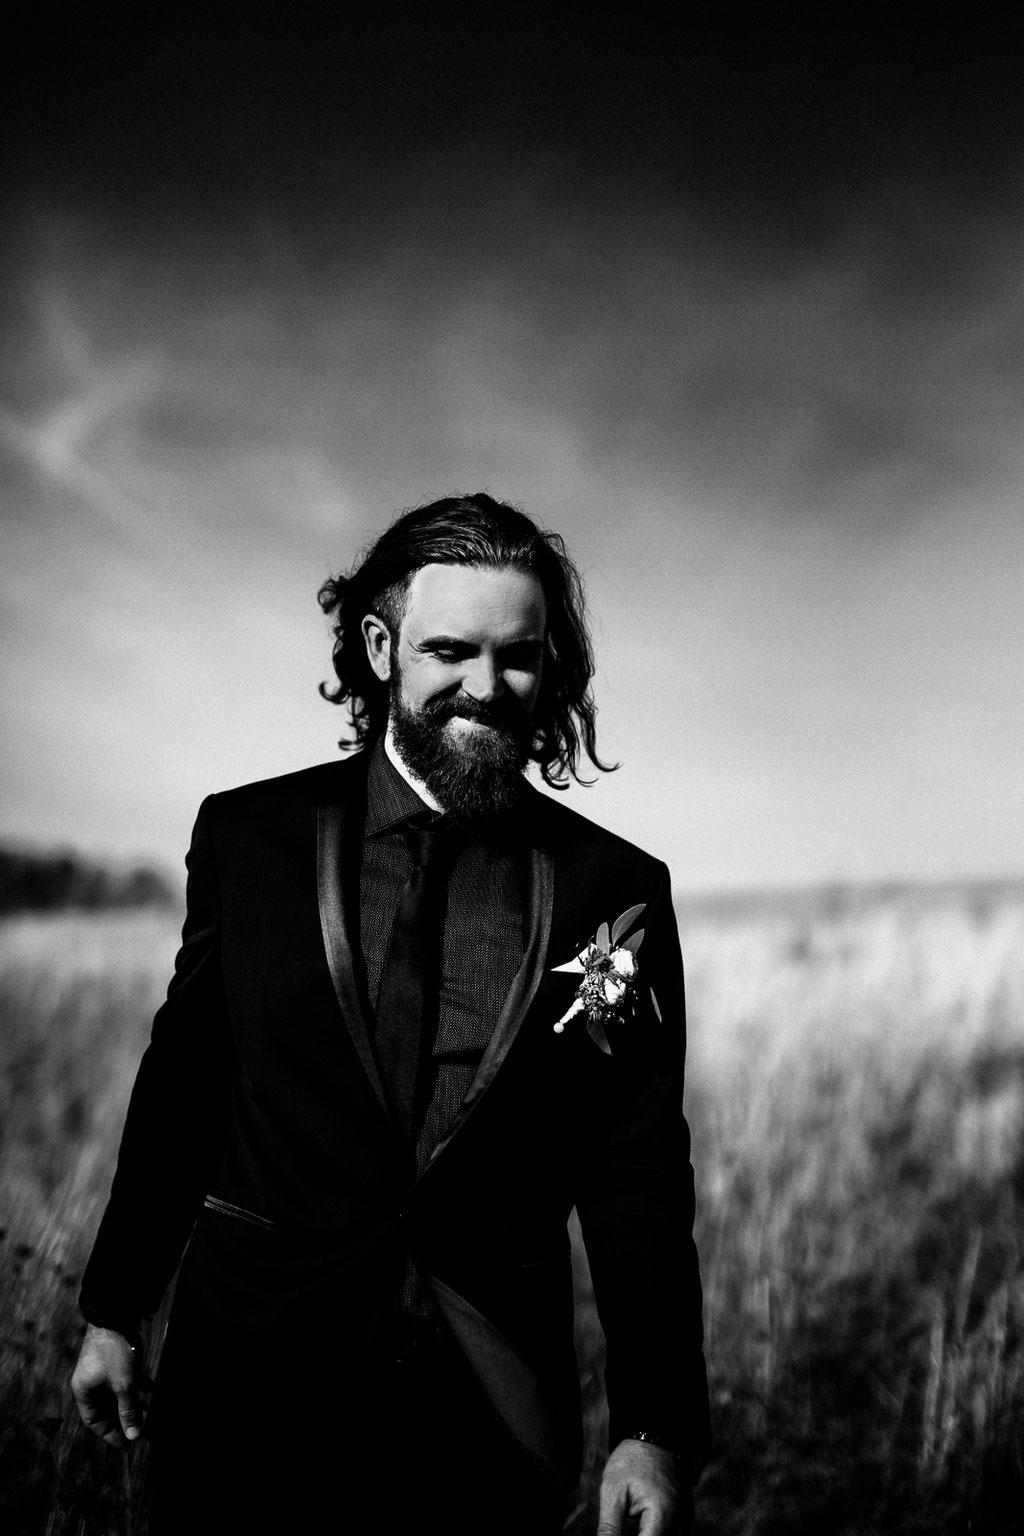 ROVA FineArt Wedding photography - boho hochzeit ansbach franken -hochzeitsfotografie - Lehrberg